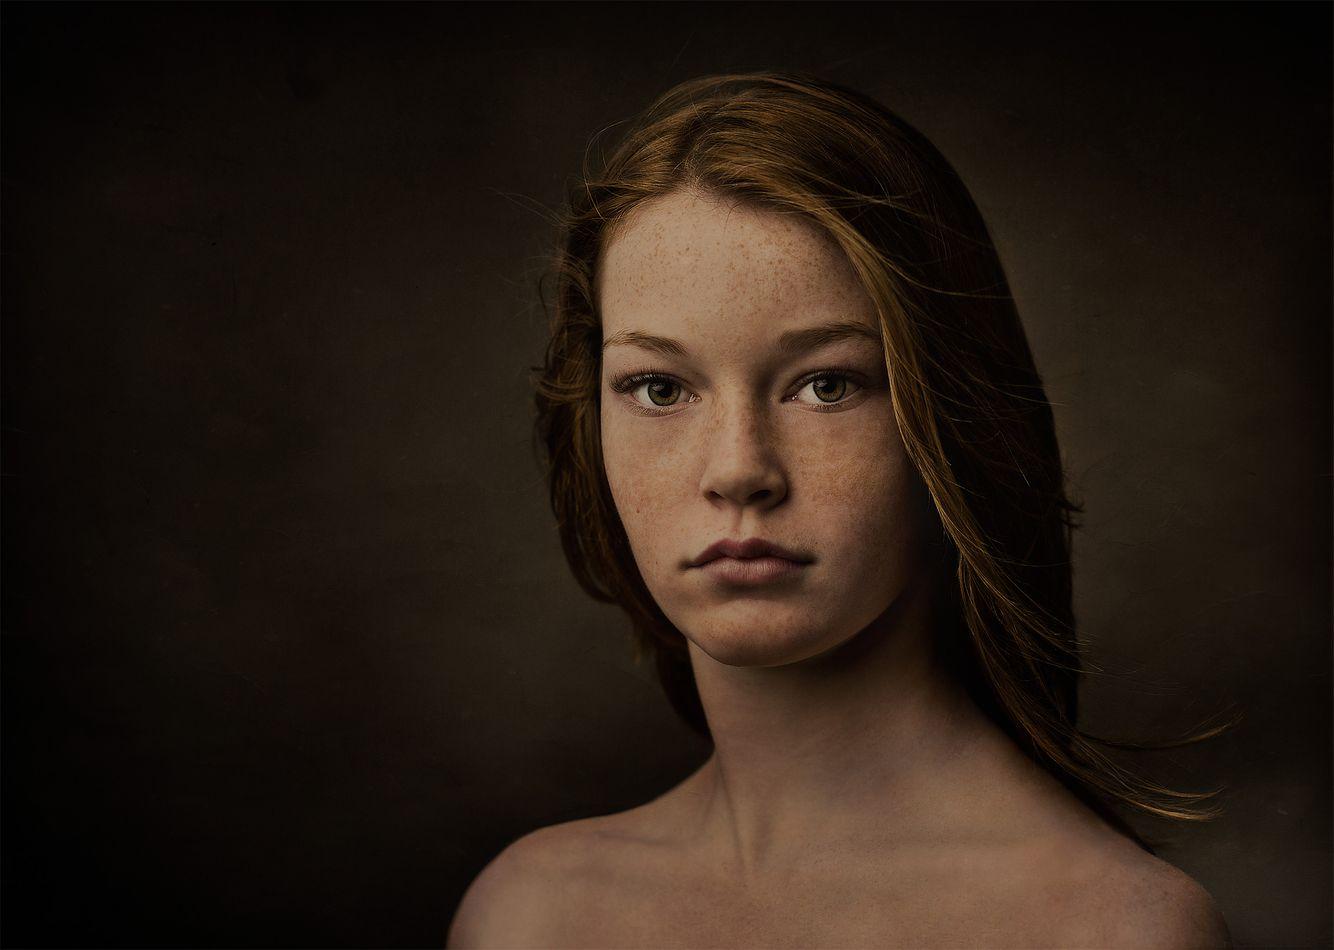 Portraits_009.jpg